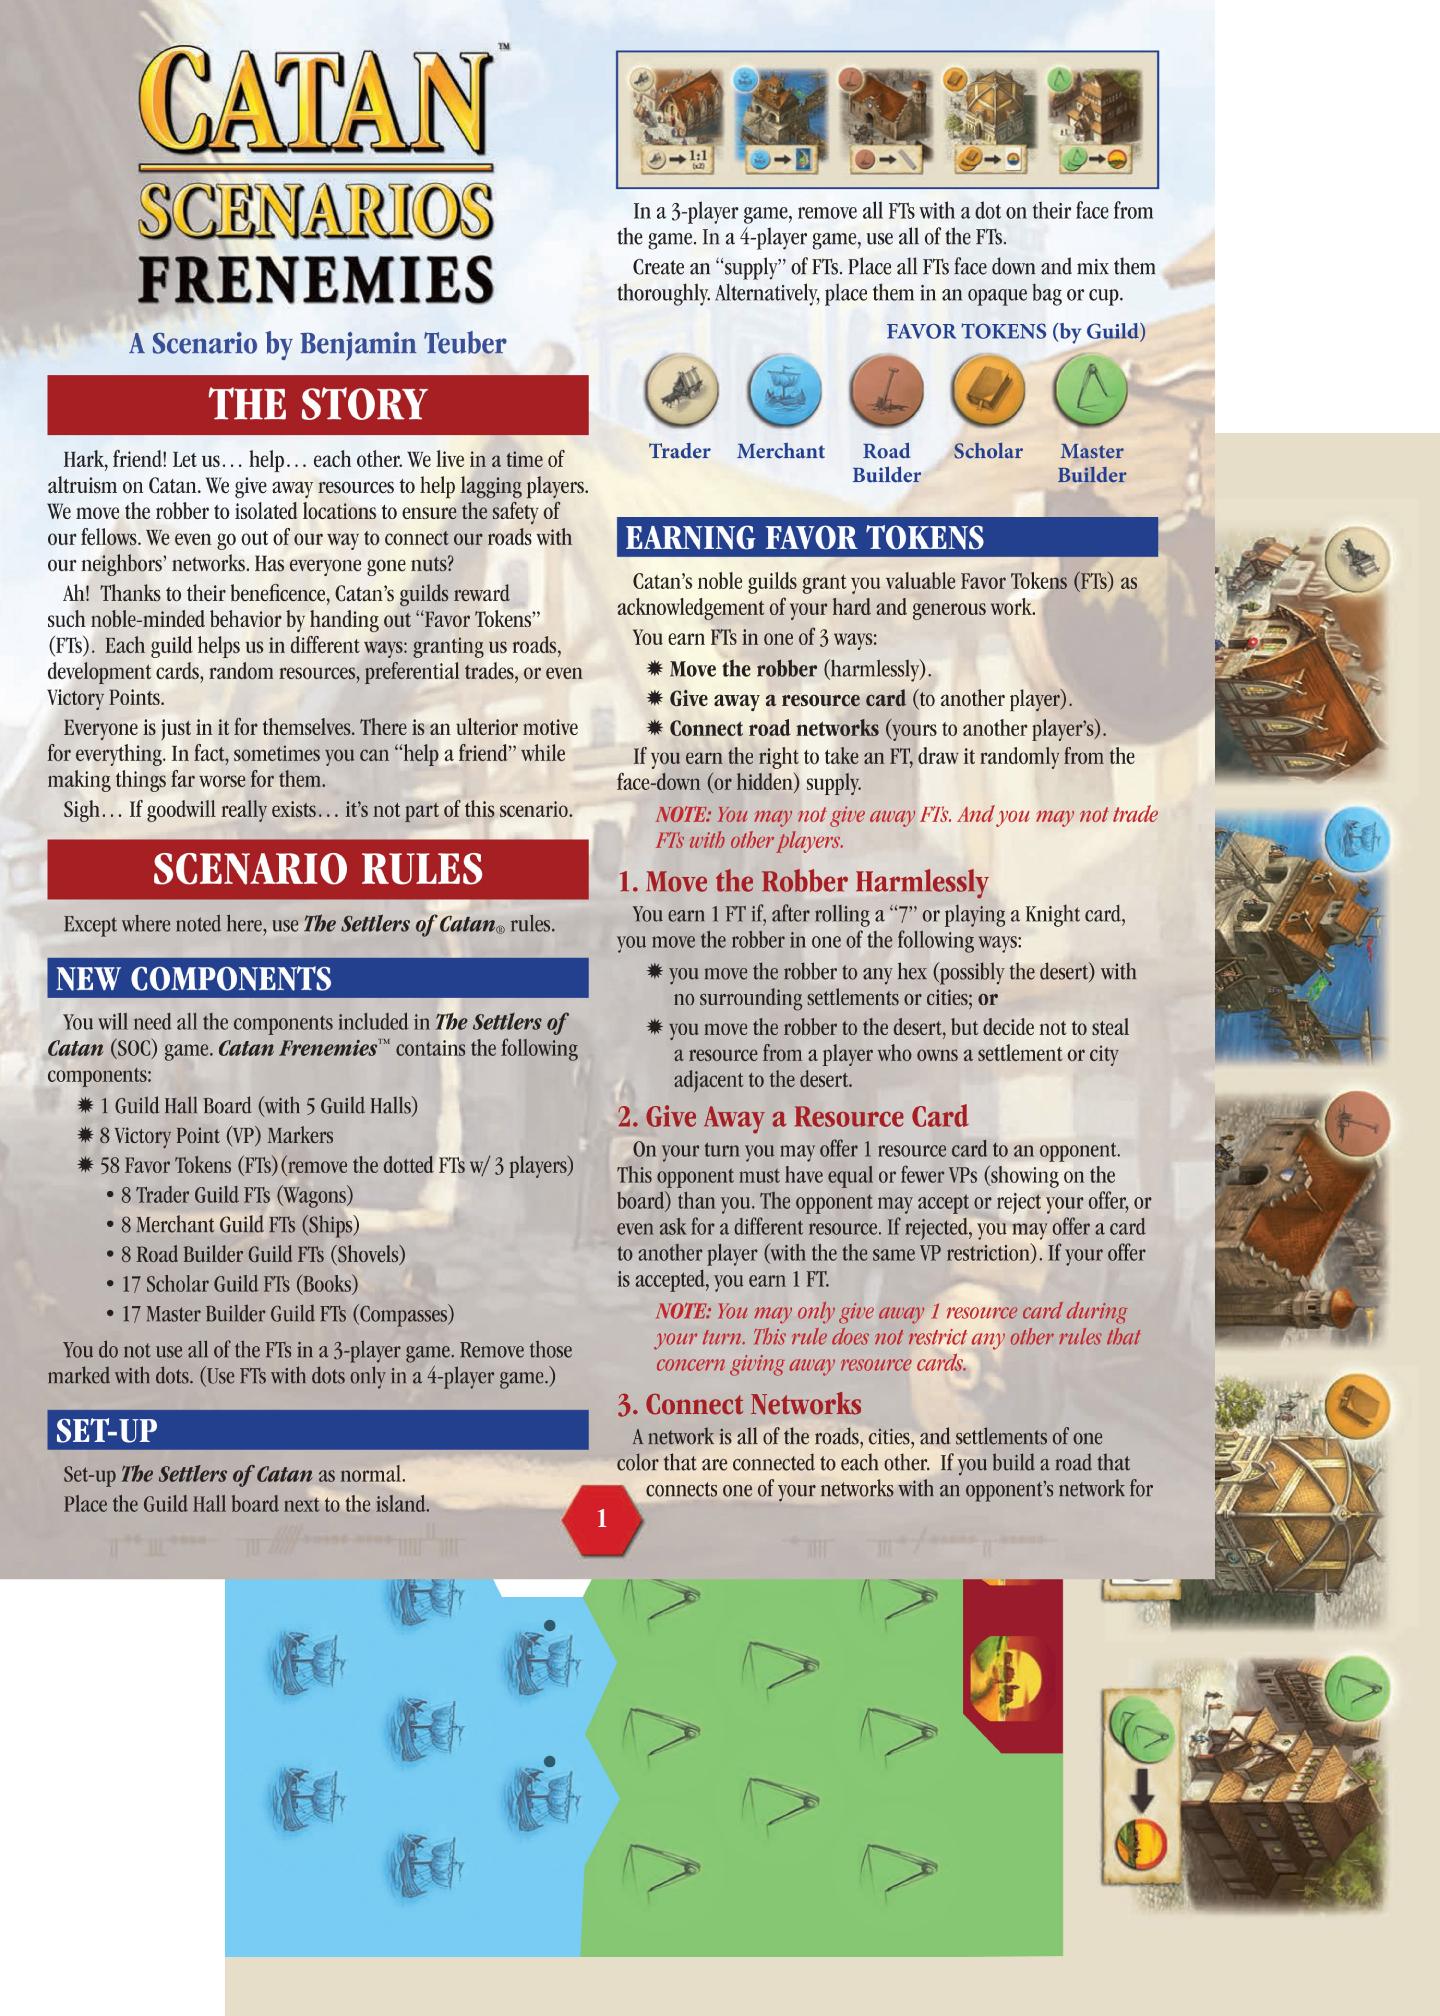 Catan Scenarios: Frenemies of Catan - Board Games - The Toy